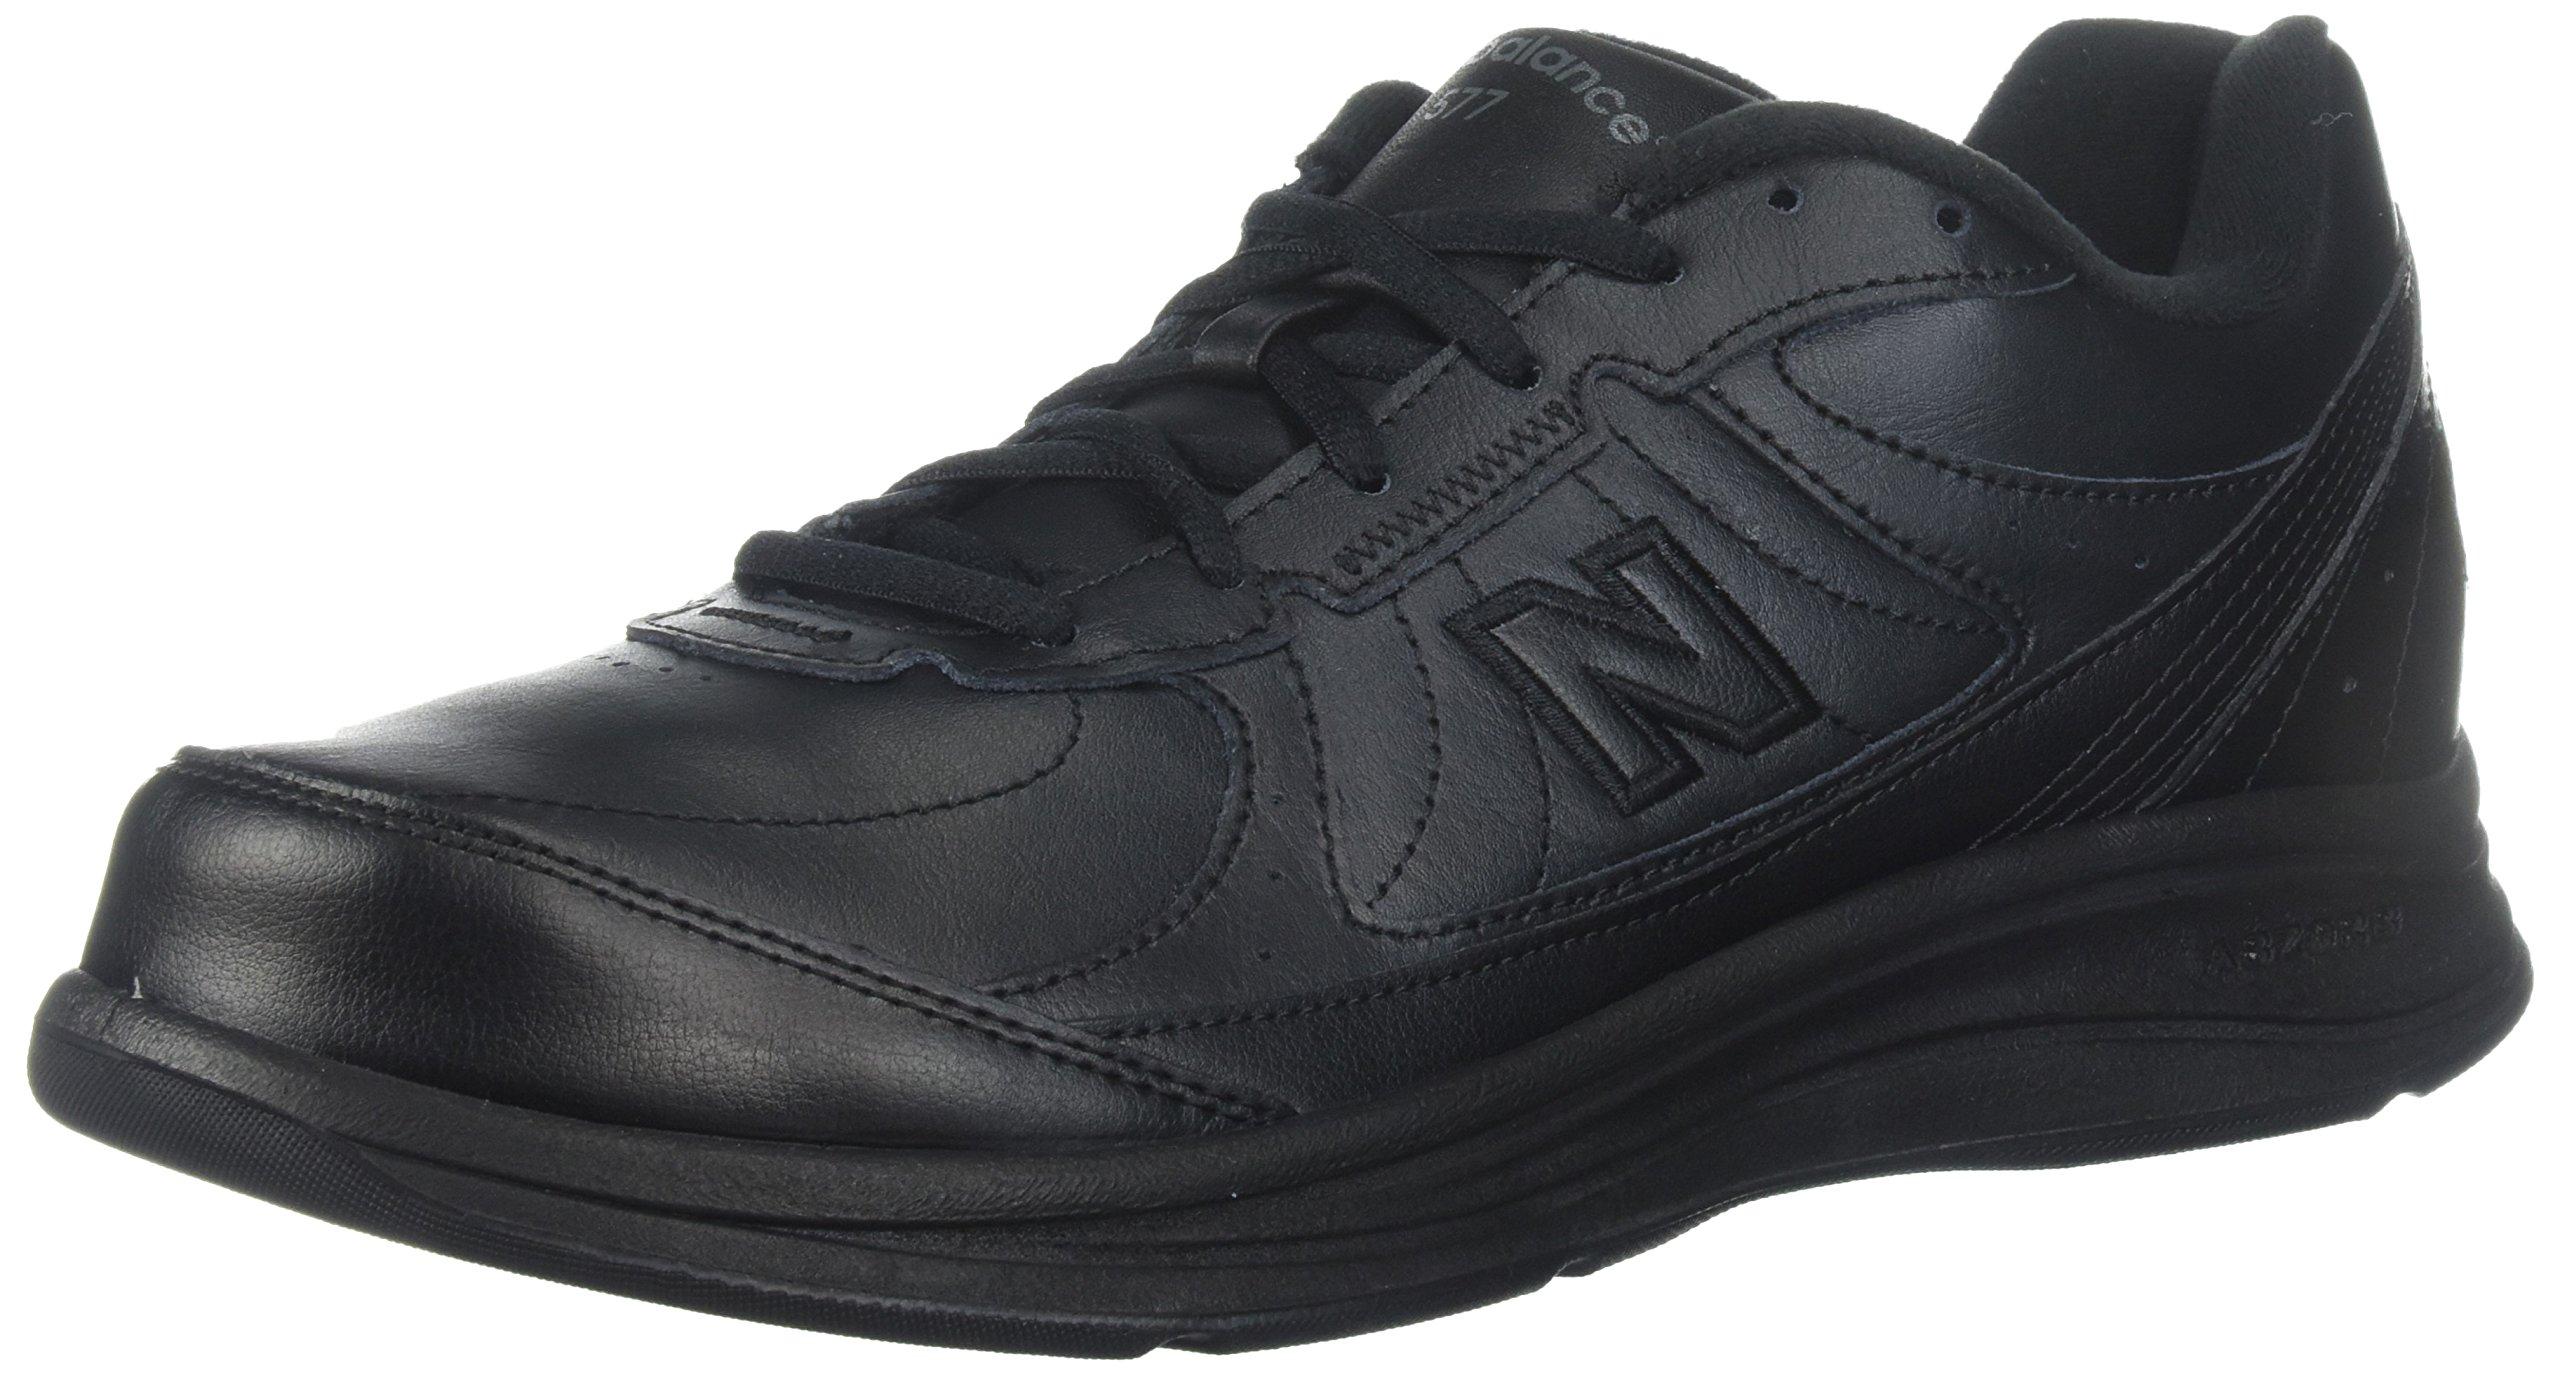 New Balance Men's MW577 Black Walking Shoe - 11.5 2E US by New Balance